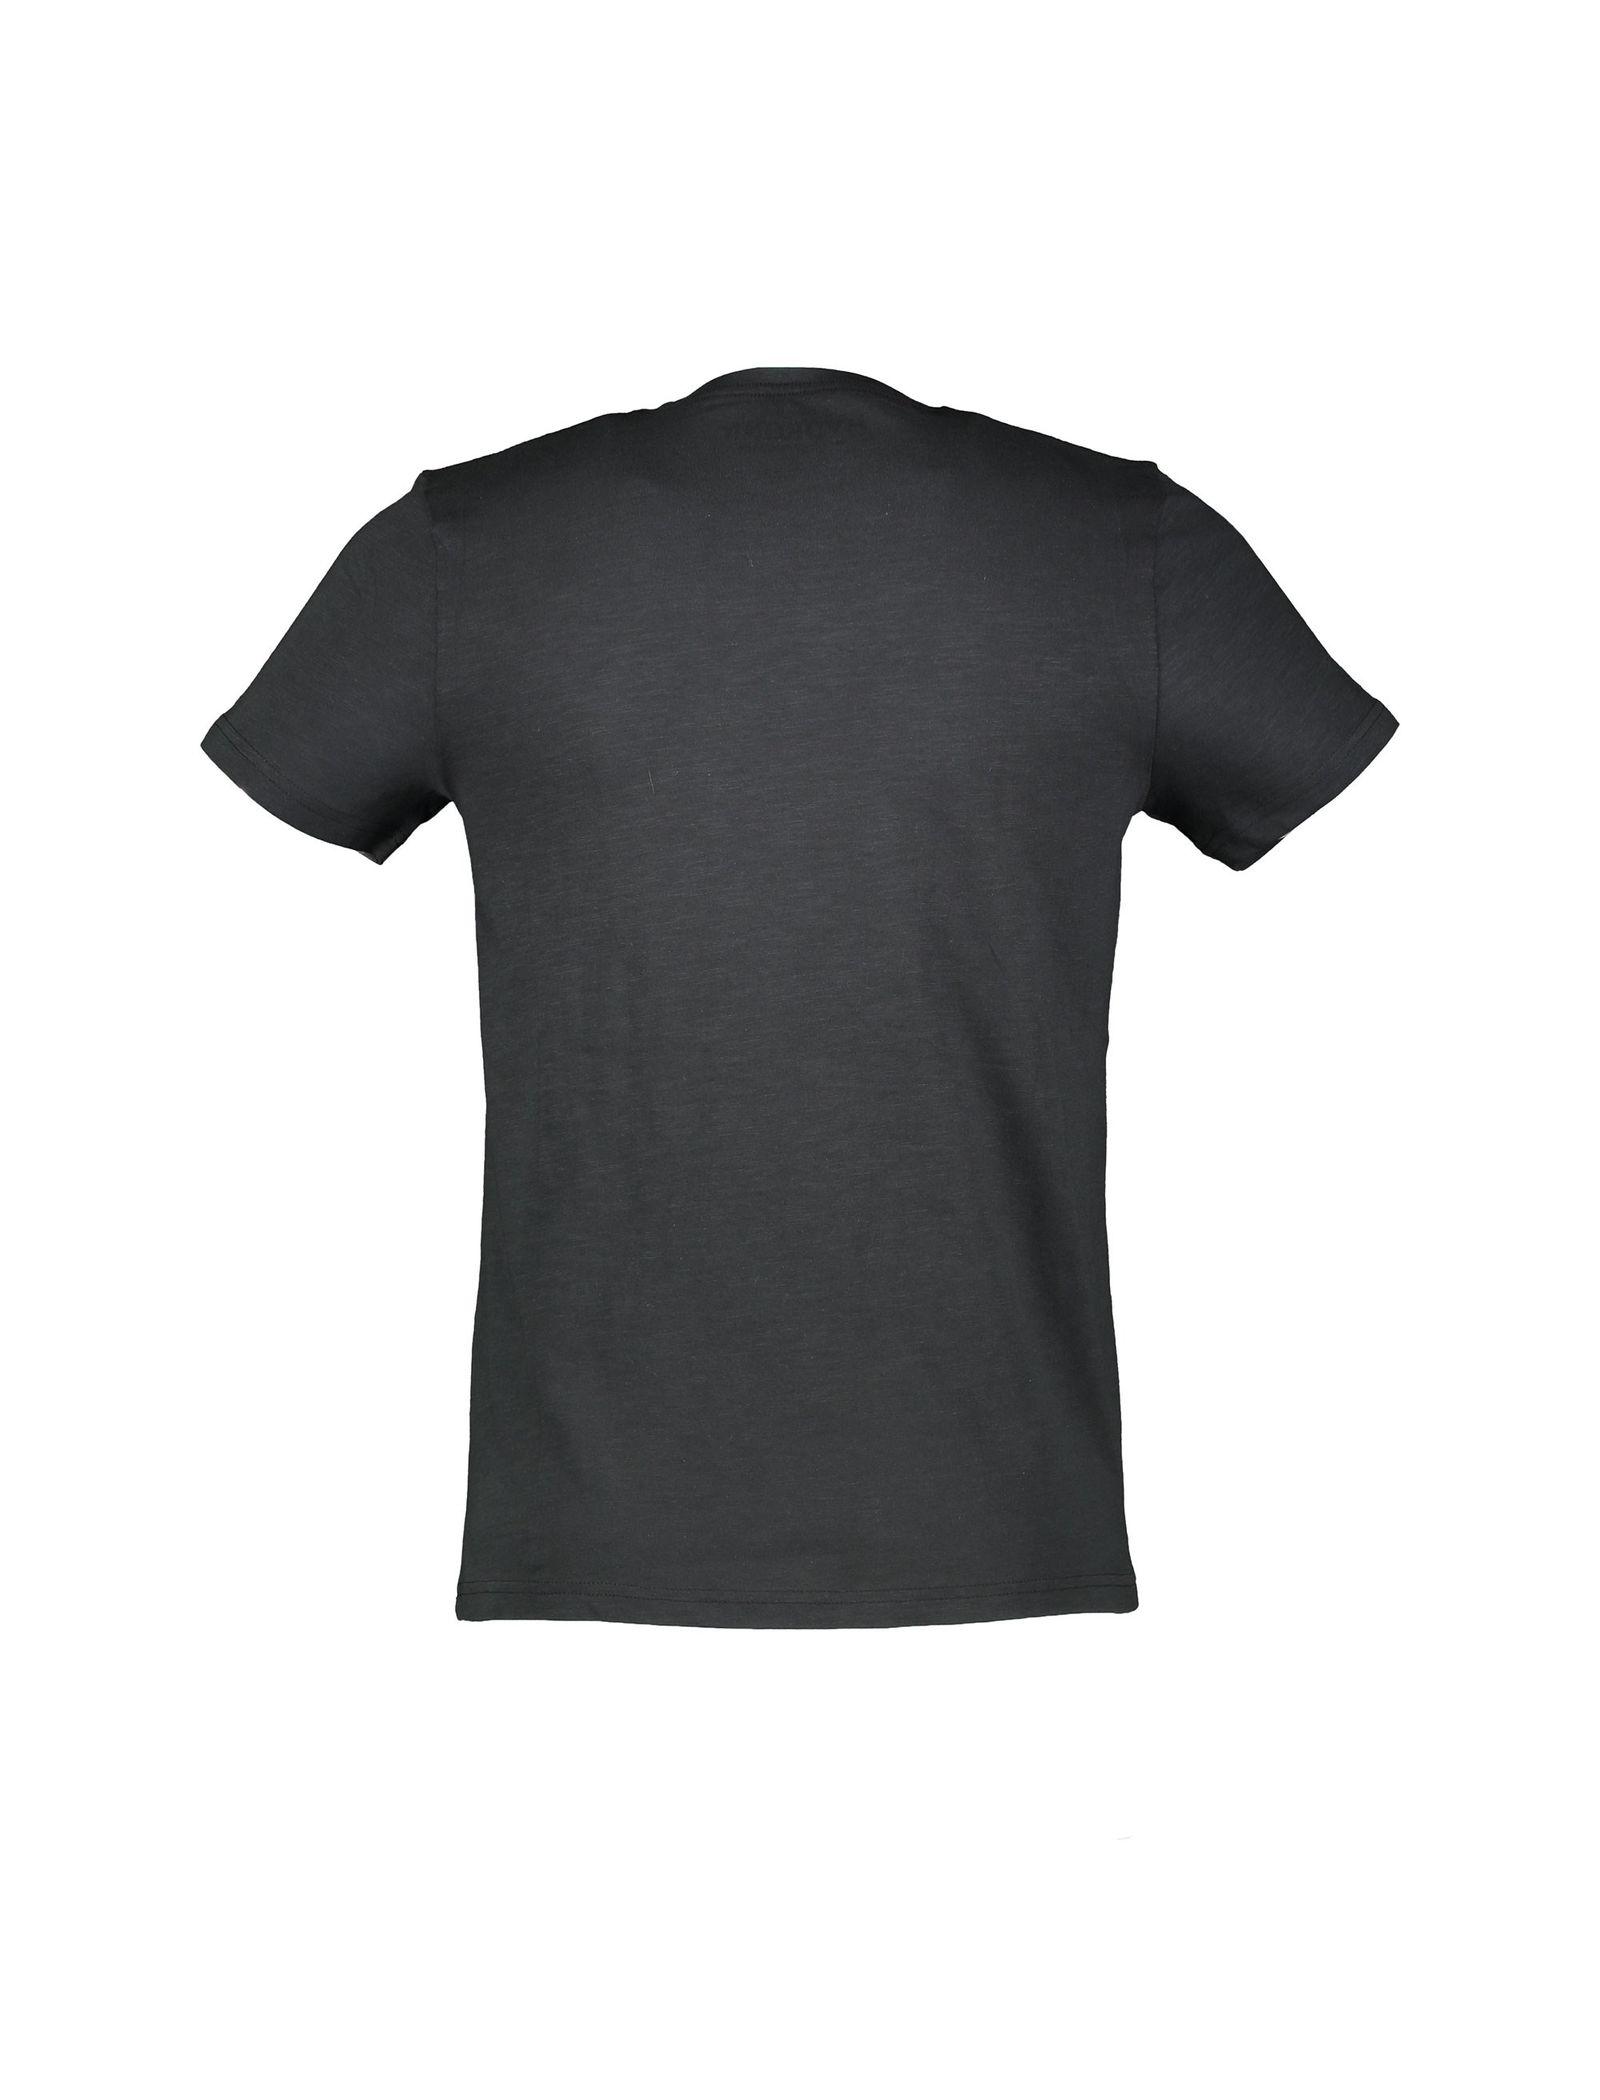 تی شرت نخی پسرانه - یوپیم - مشکي - 2